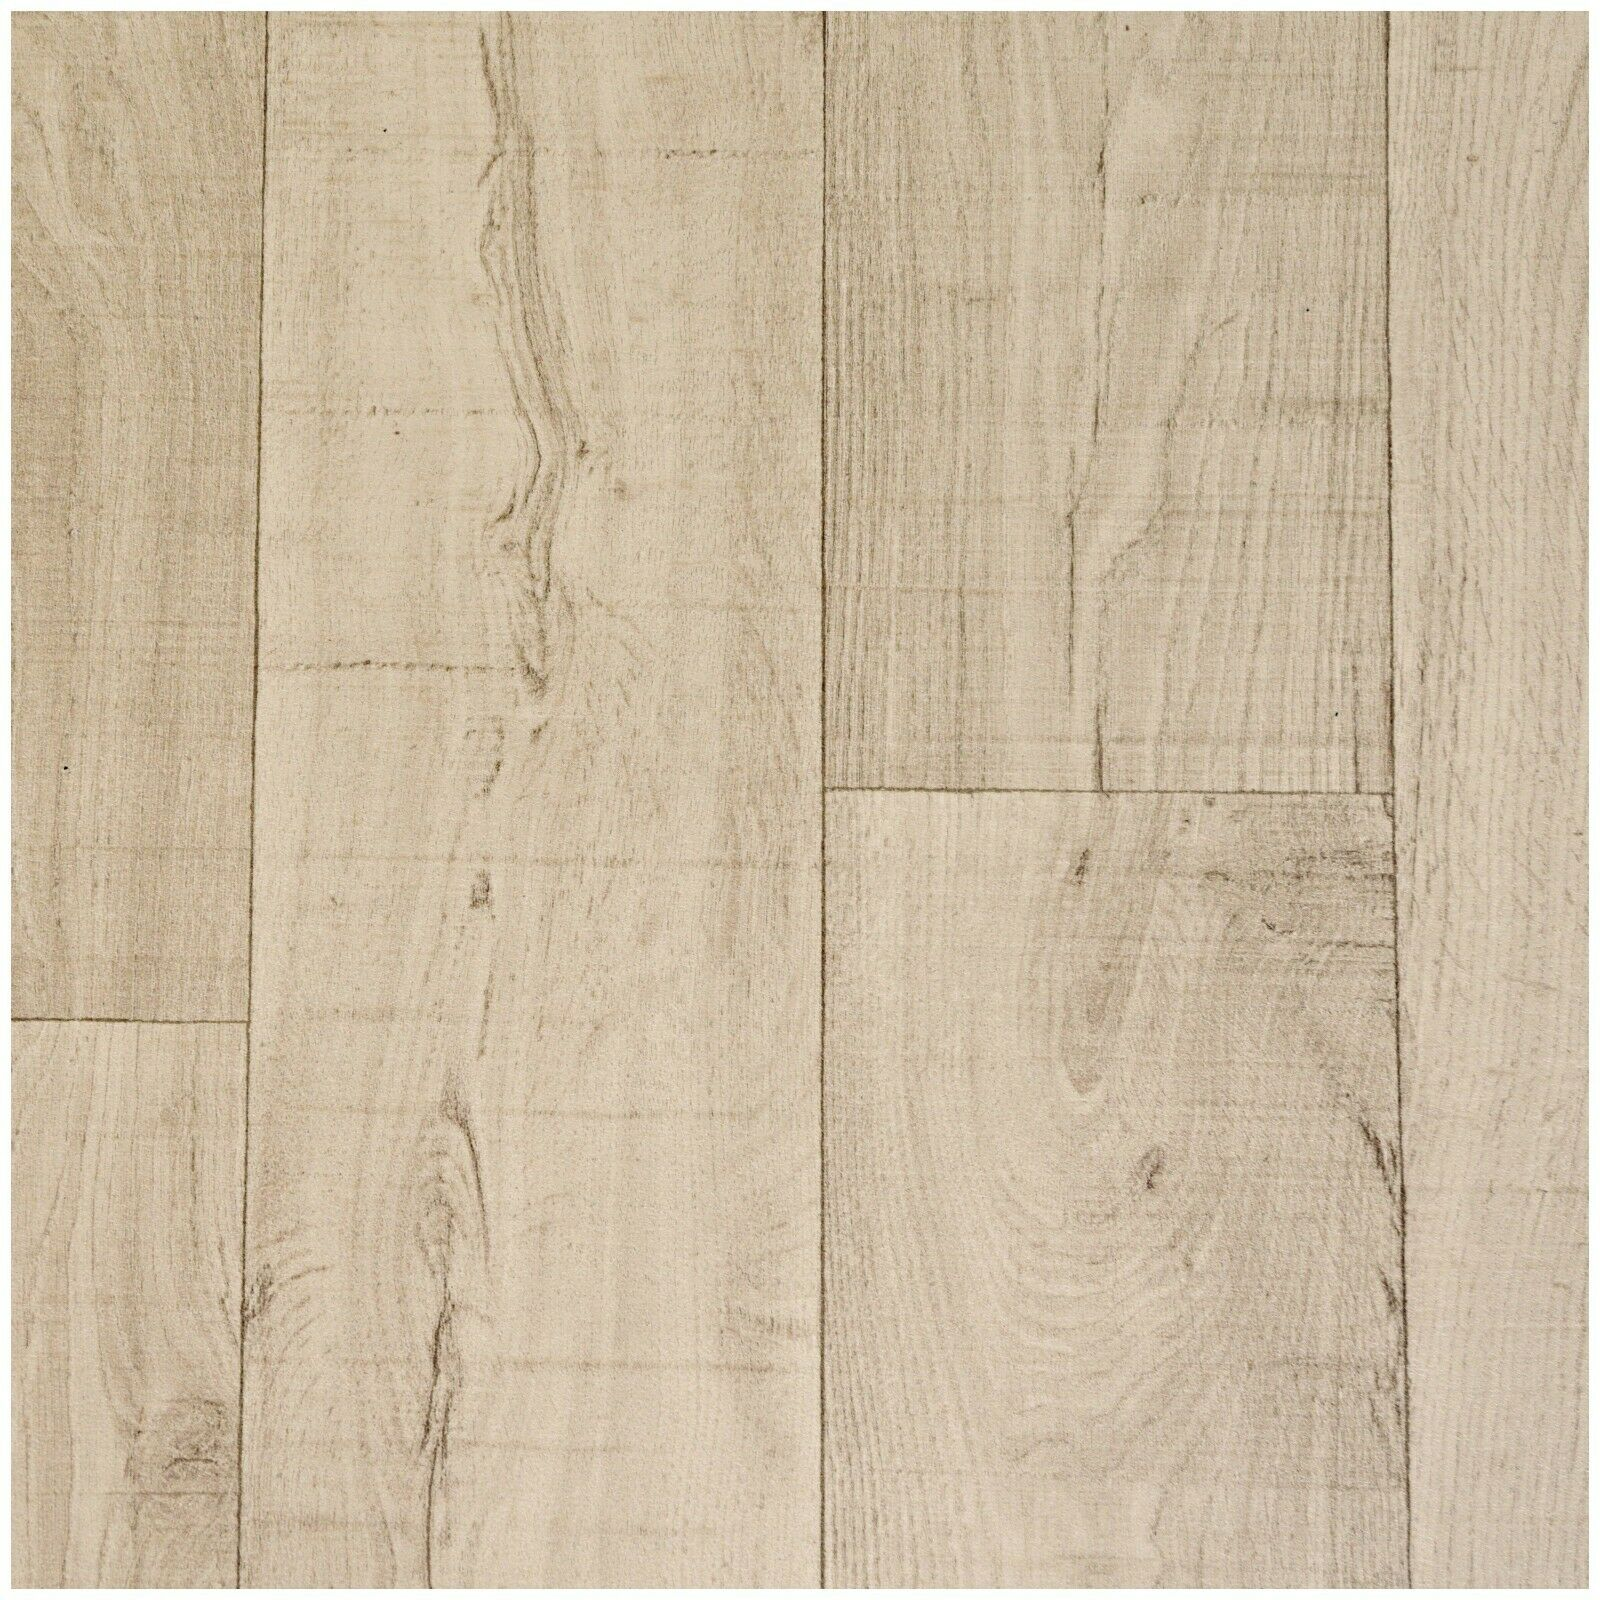 3m /& 4m Wide £11.99m² MODERN Light Grey Oak Wood Effect Vinyl Floor 2m